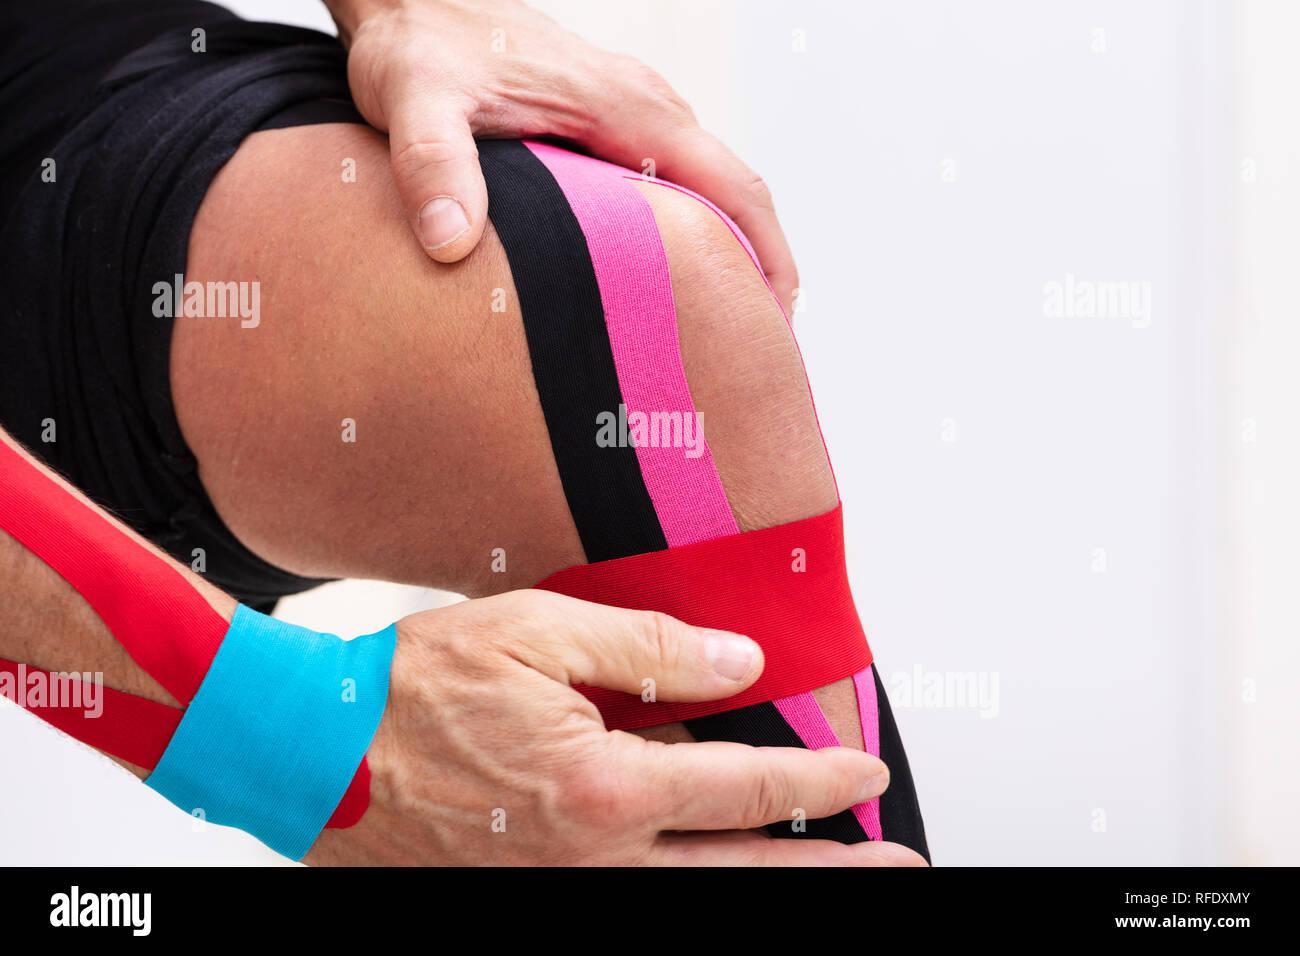 Man Sitting On Table Applying Kinesiology Tape On His Knee - Stock Image